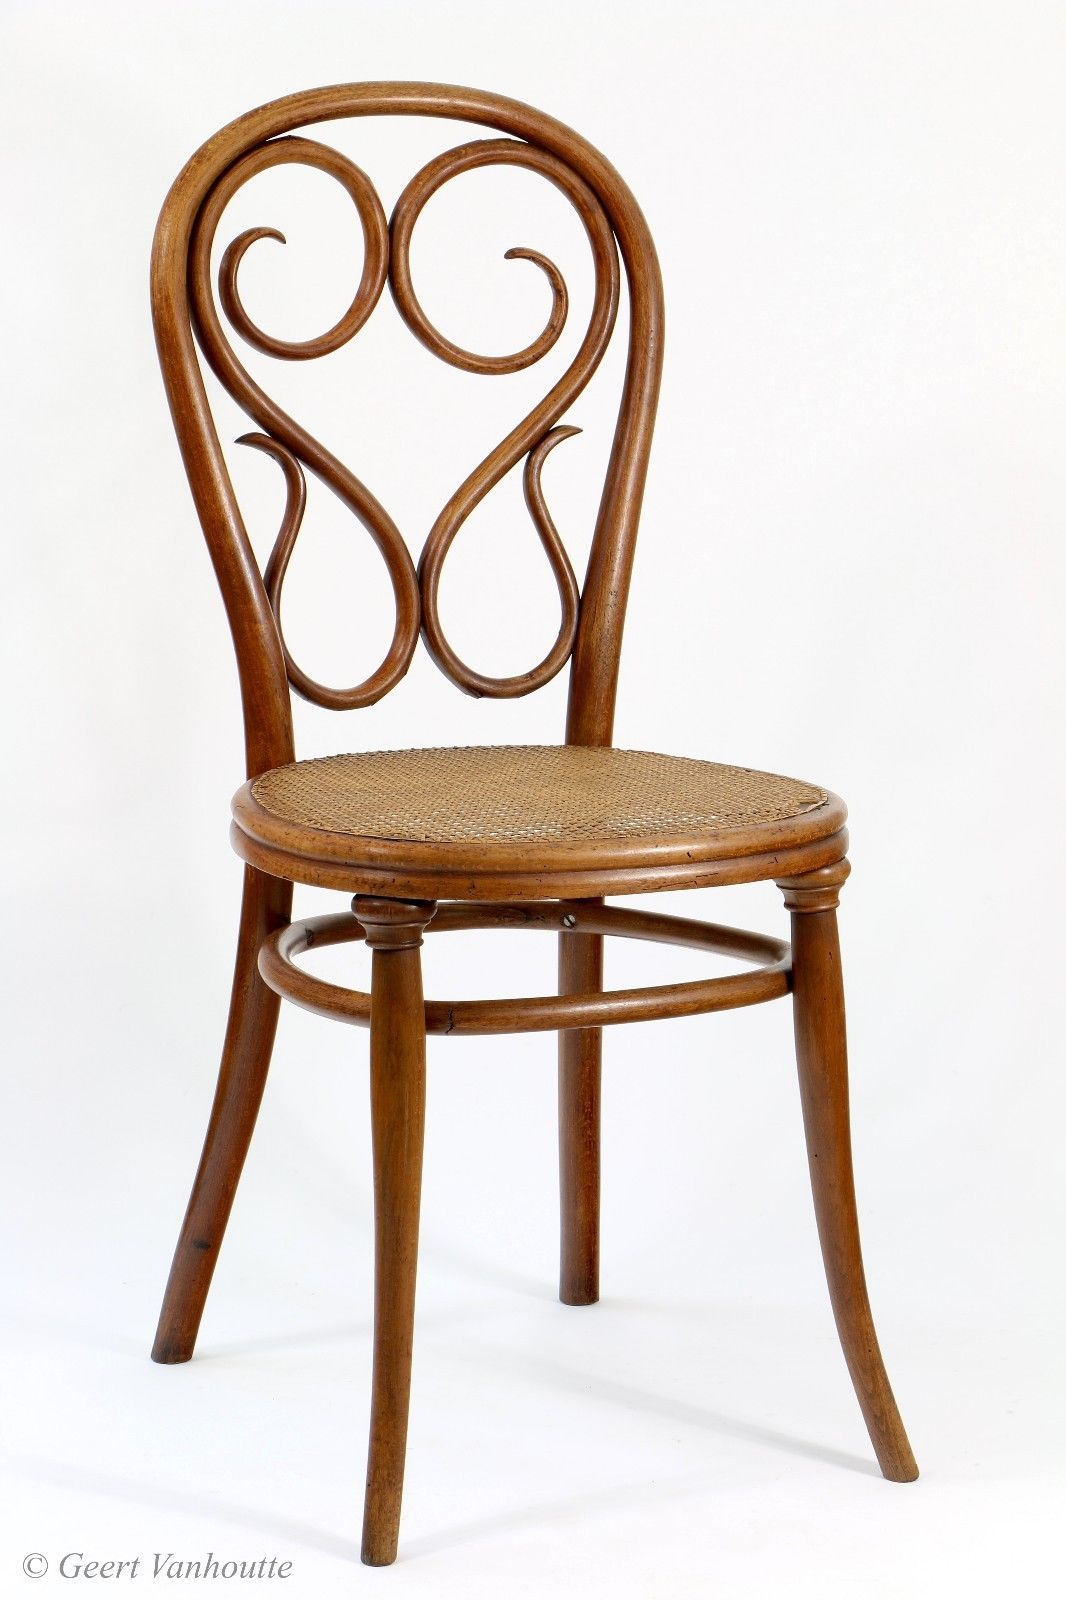 Thonet Sessel Nr 4 Cafe Daum Ca 1870 Sillas Diseno De Muebles Muebles